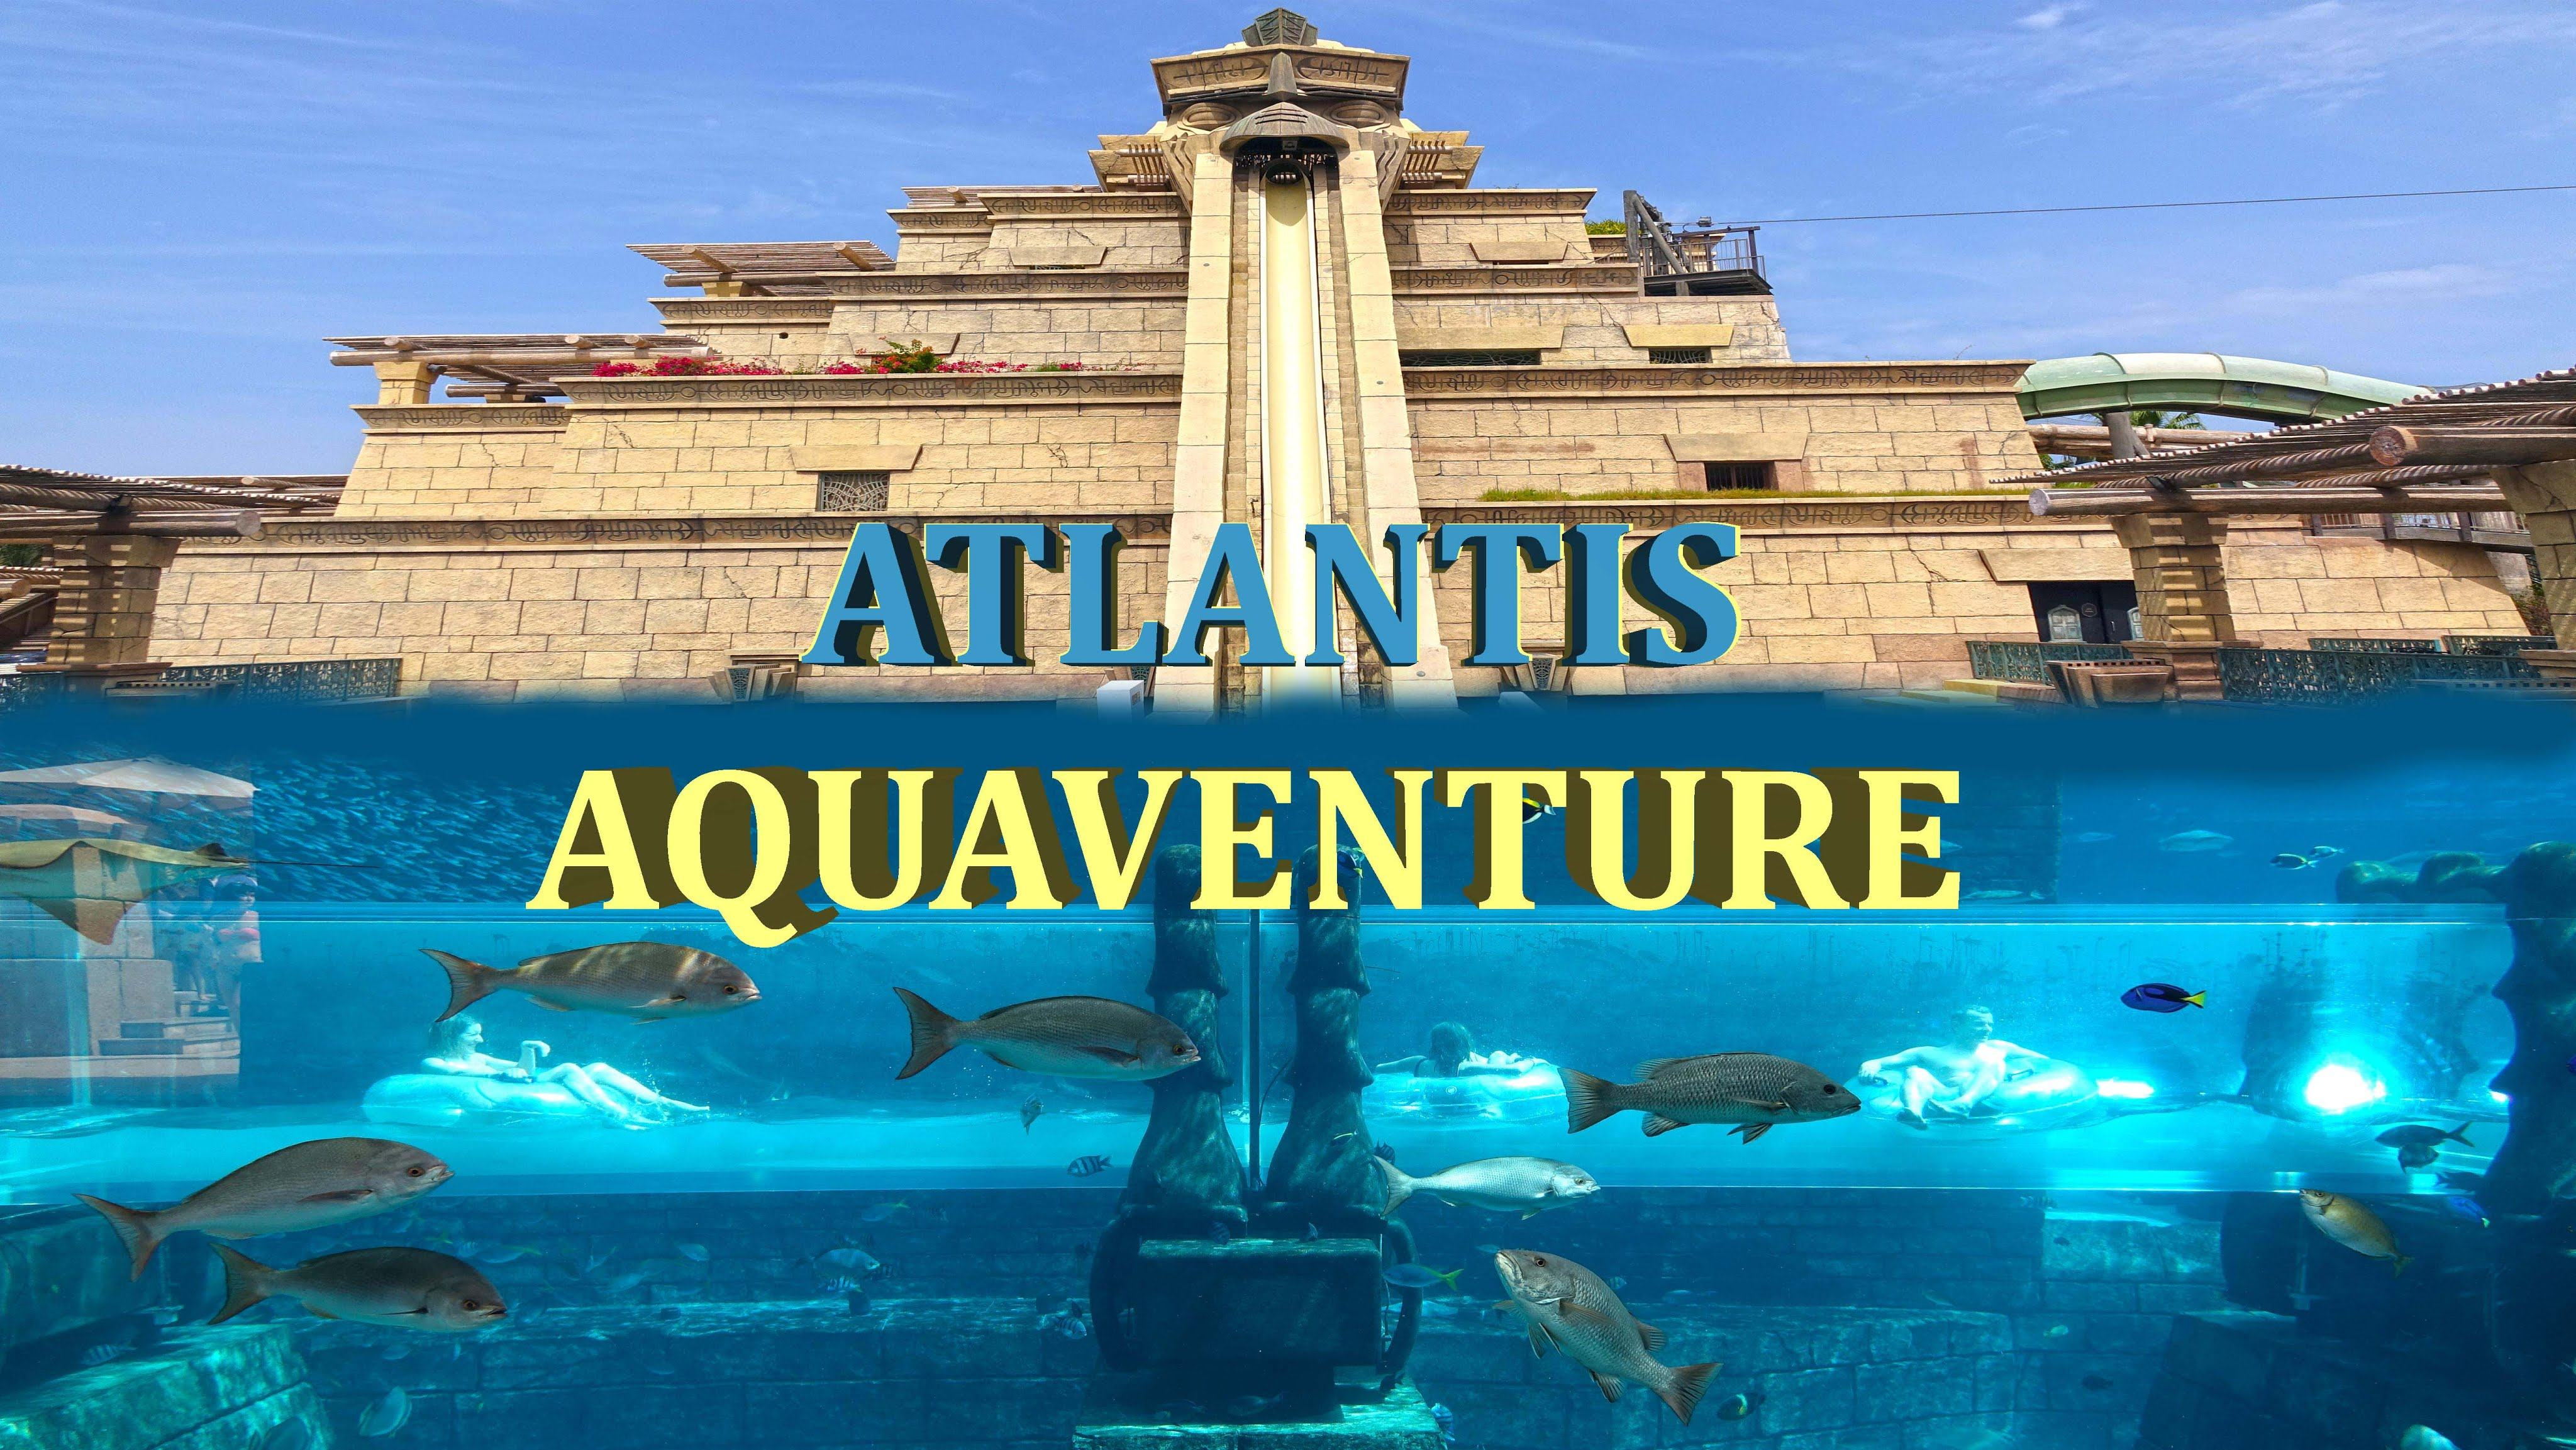 Aquaventure + Lost Chamber